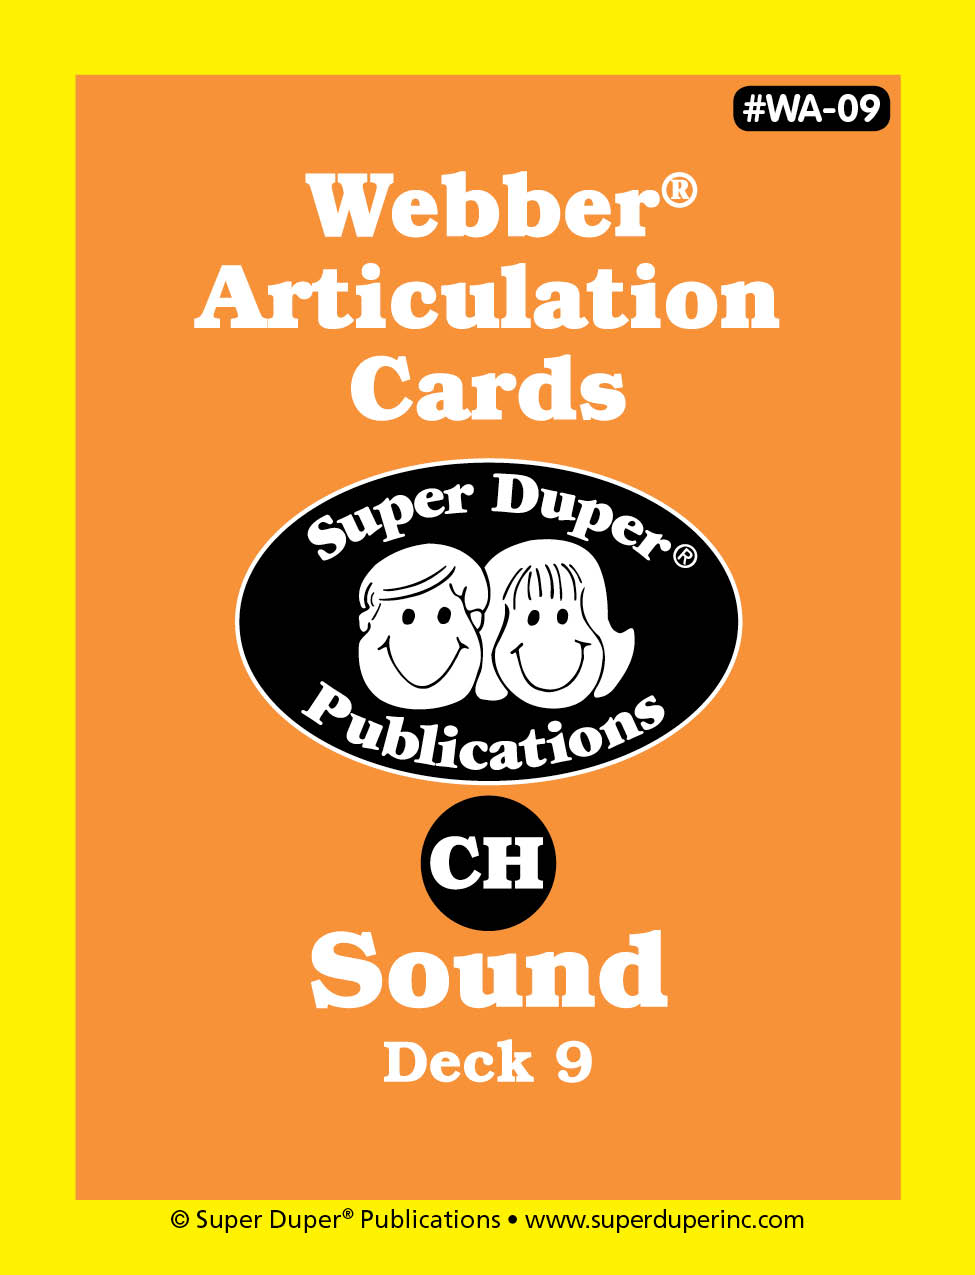 Webber Articulation Cards - CH